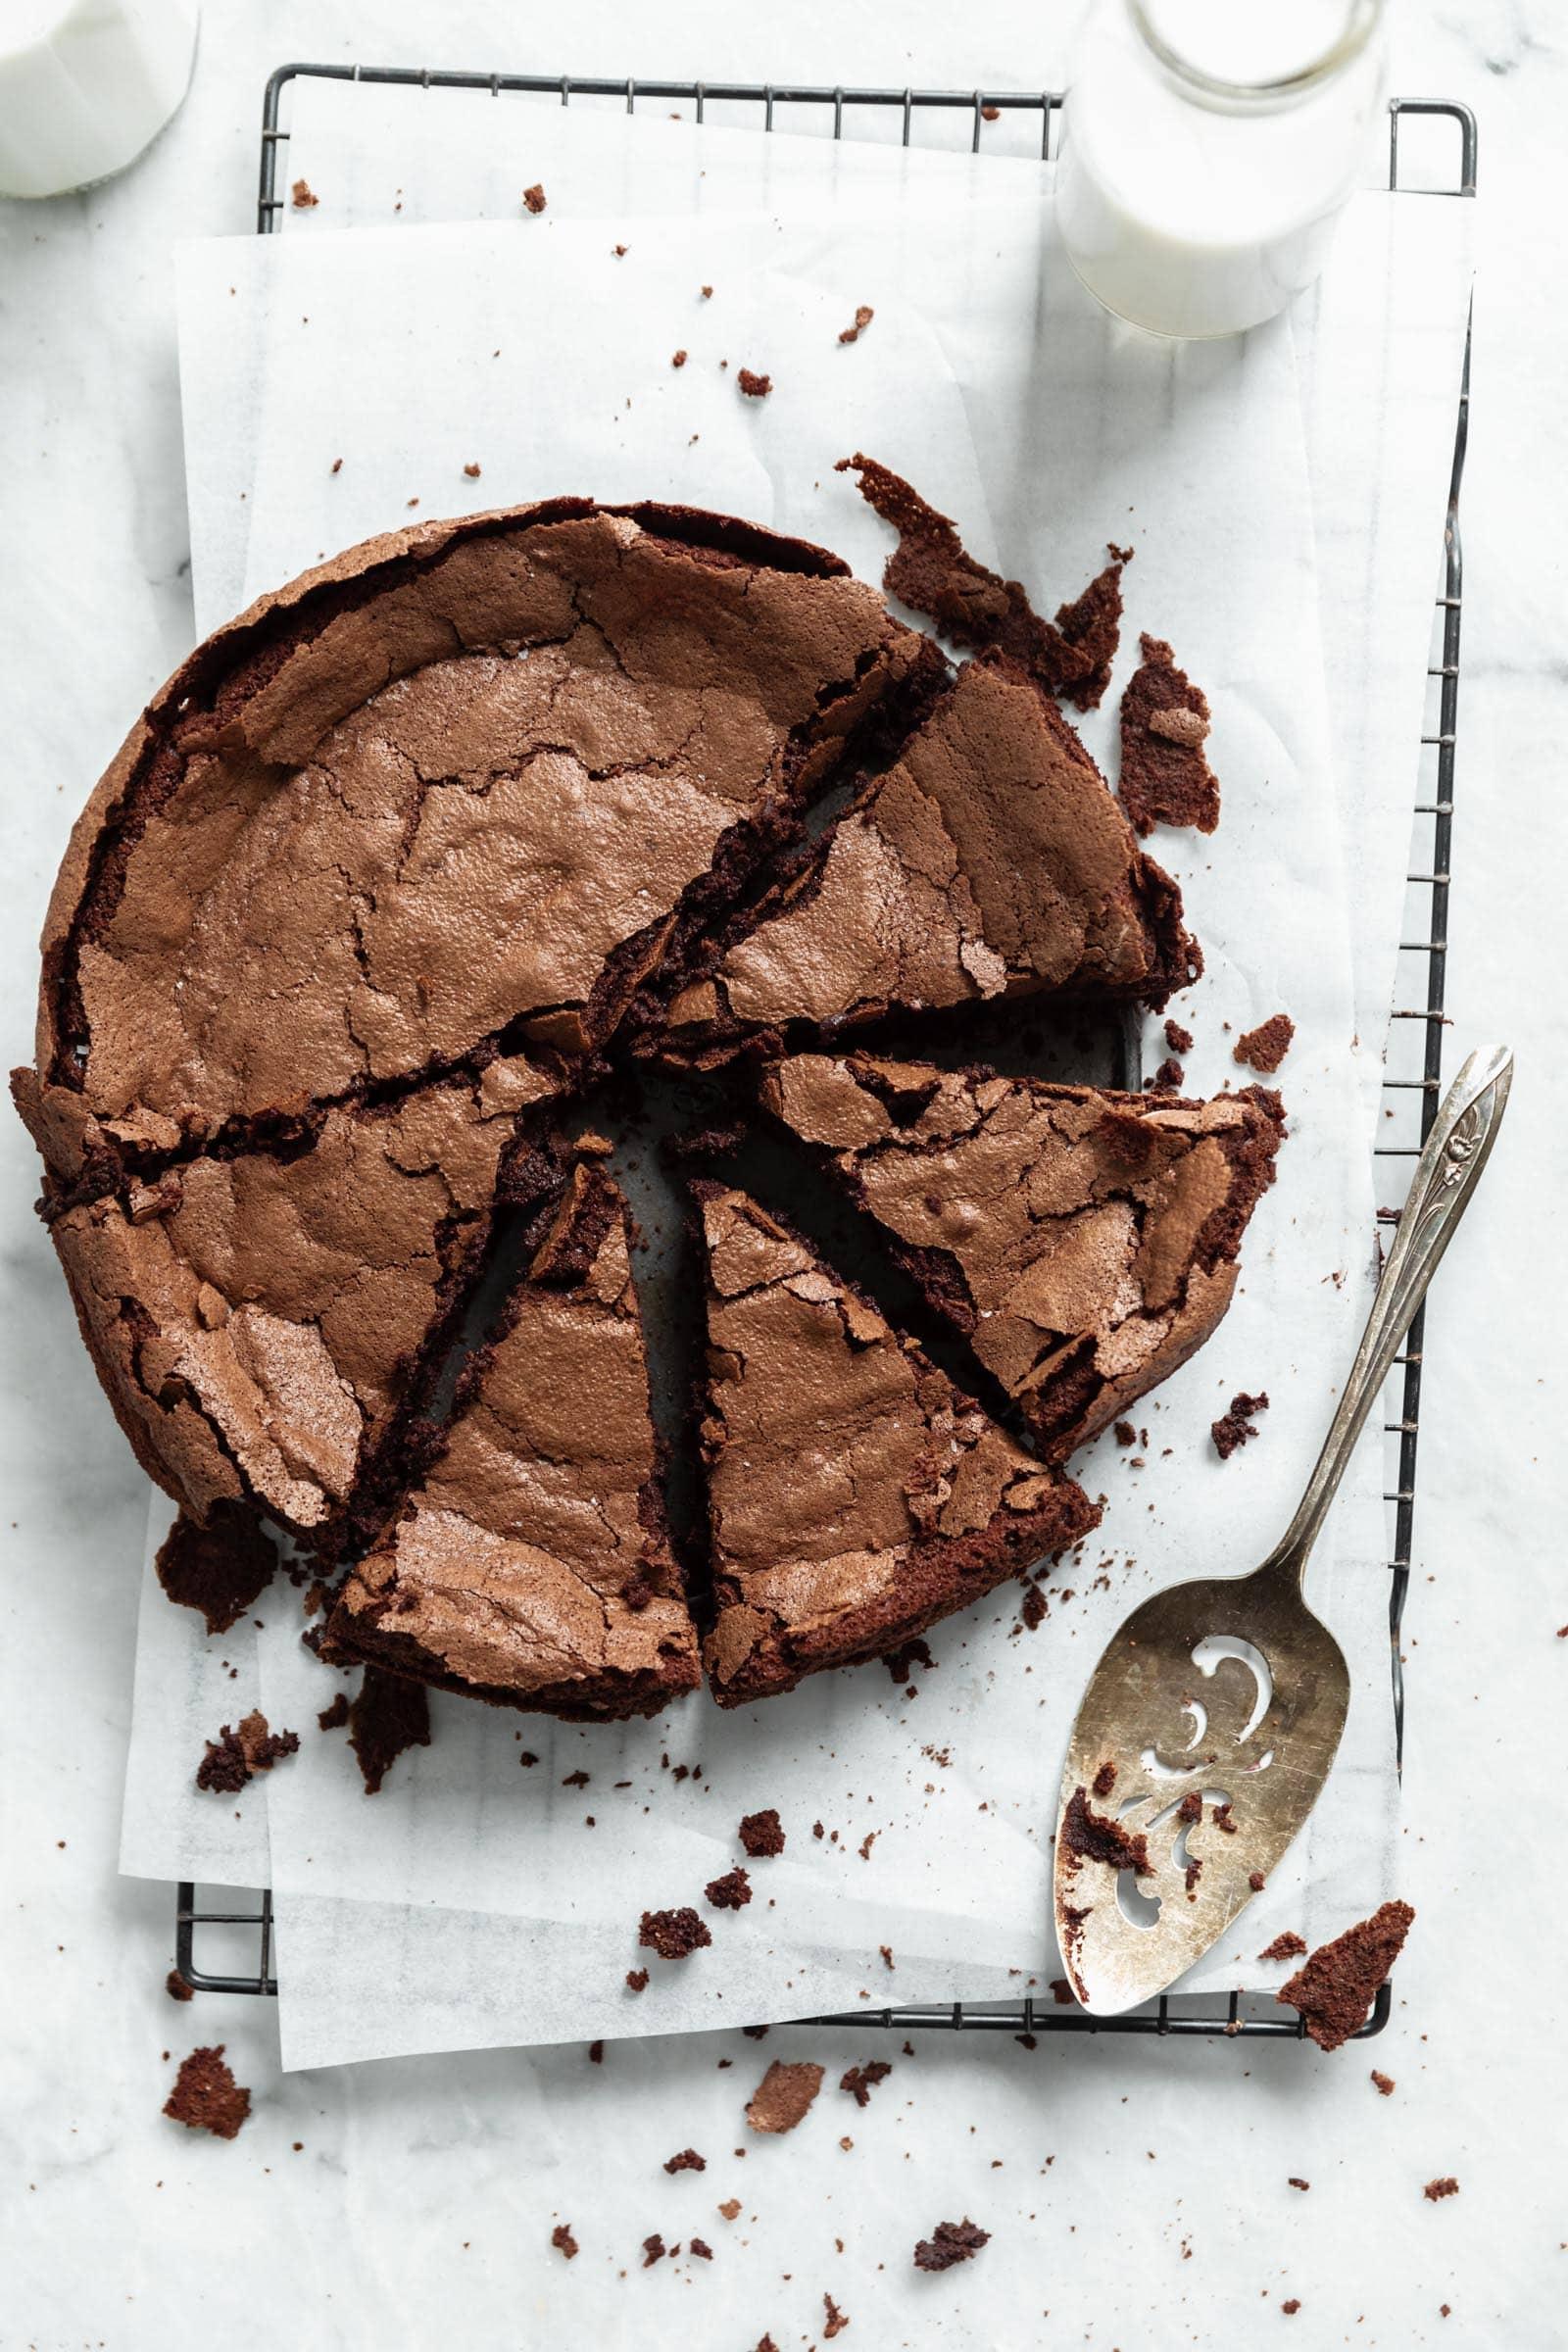 fallen chocolate cake cut into slices